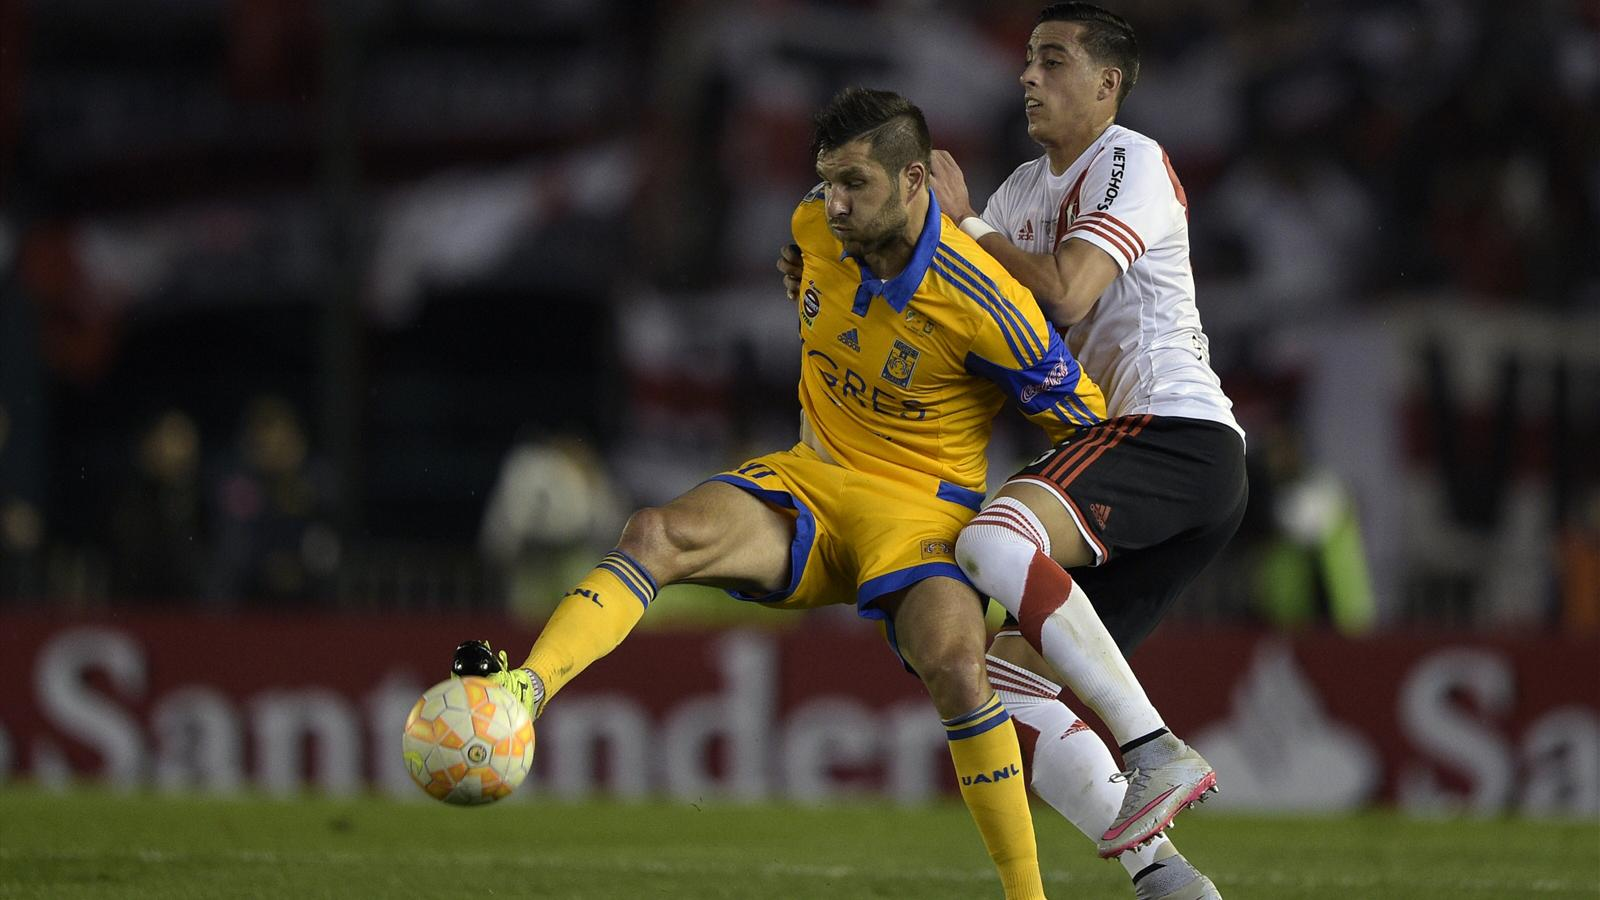 André-Pierre Gignac (Tigres Monterrey) contre River Plate en finale retour de la Copa Libertadores le 5 août 2015